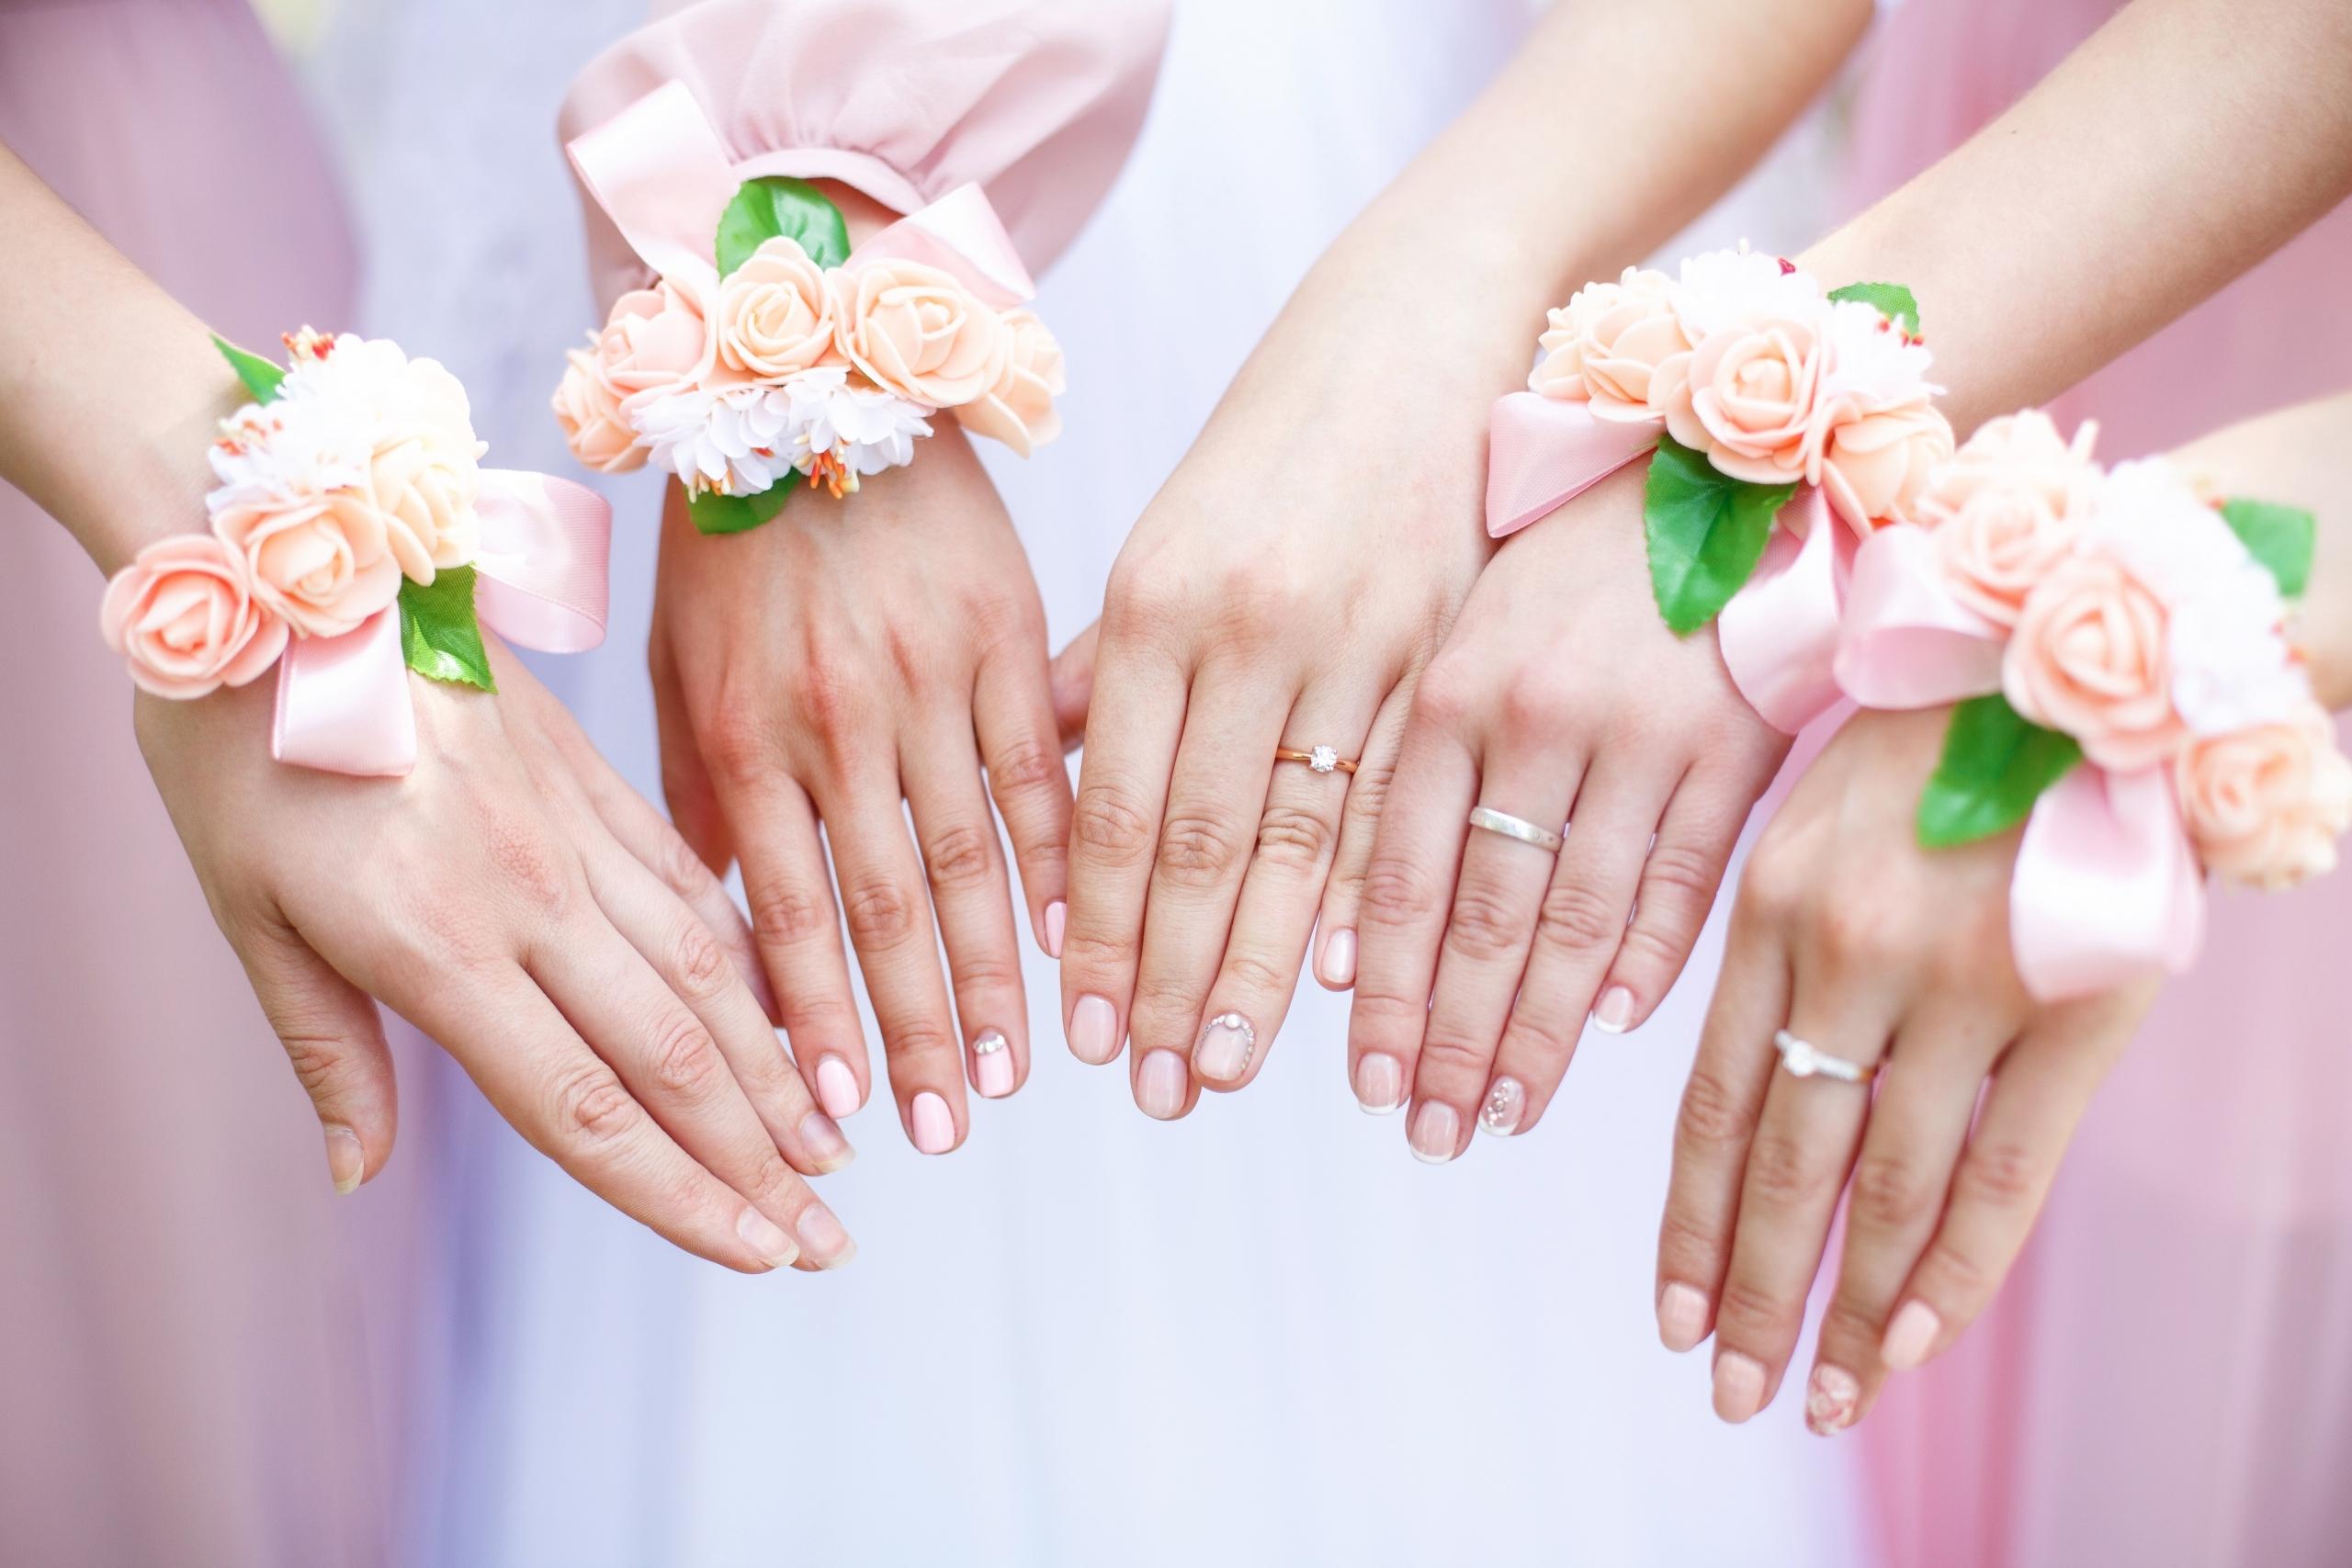 Verschil trouwringen